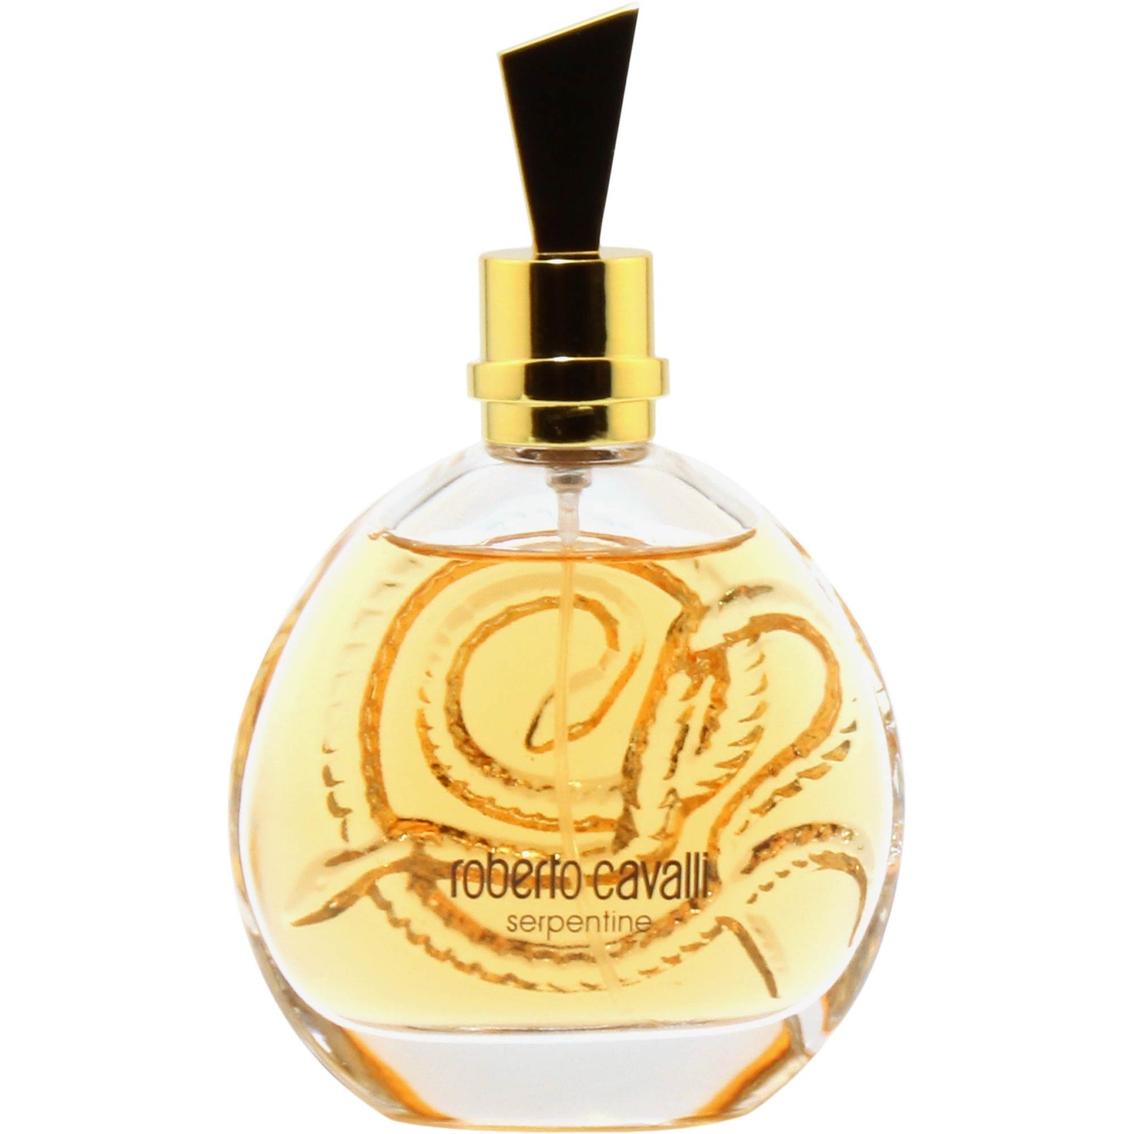 Roberto Cavalli Serpentine Eau De Parfum Spray | Women's ...